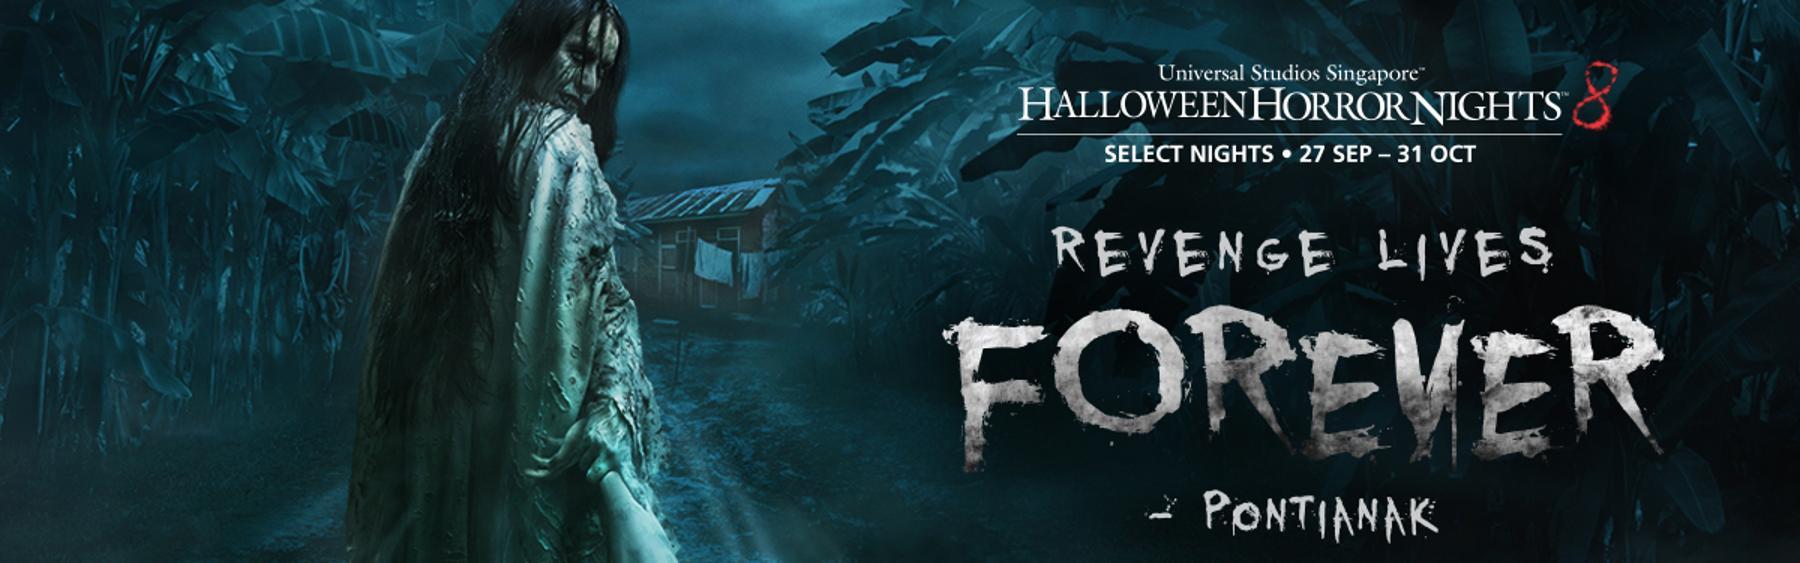 halloween horror nights 8 | buy tickets | hapz